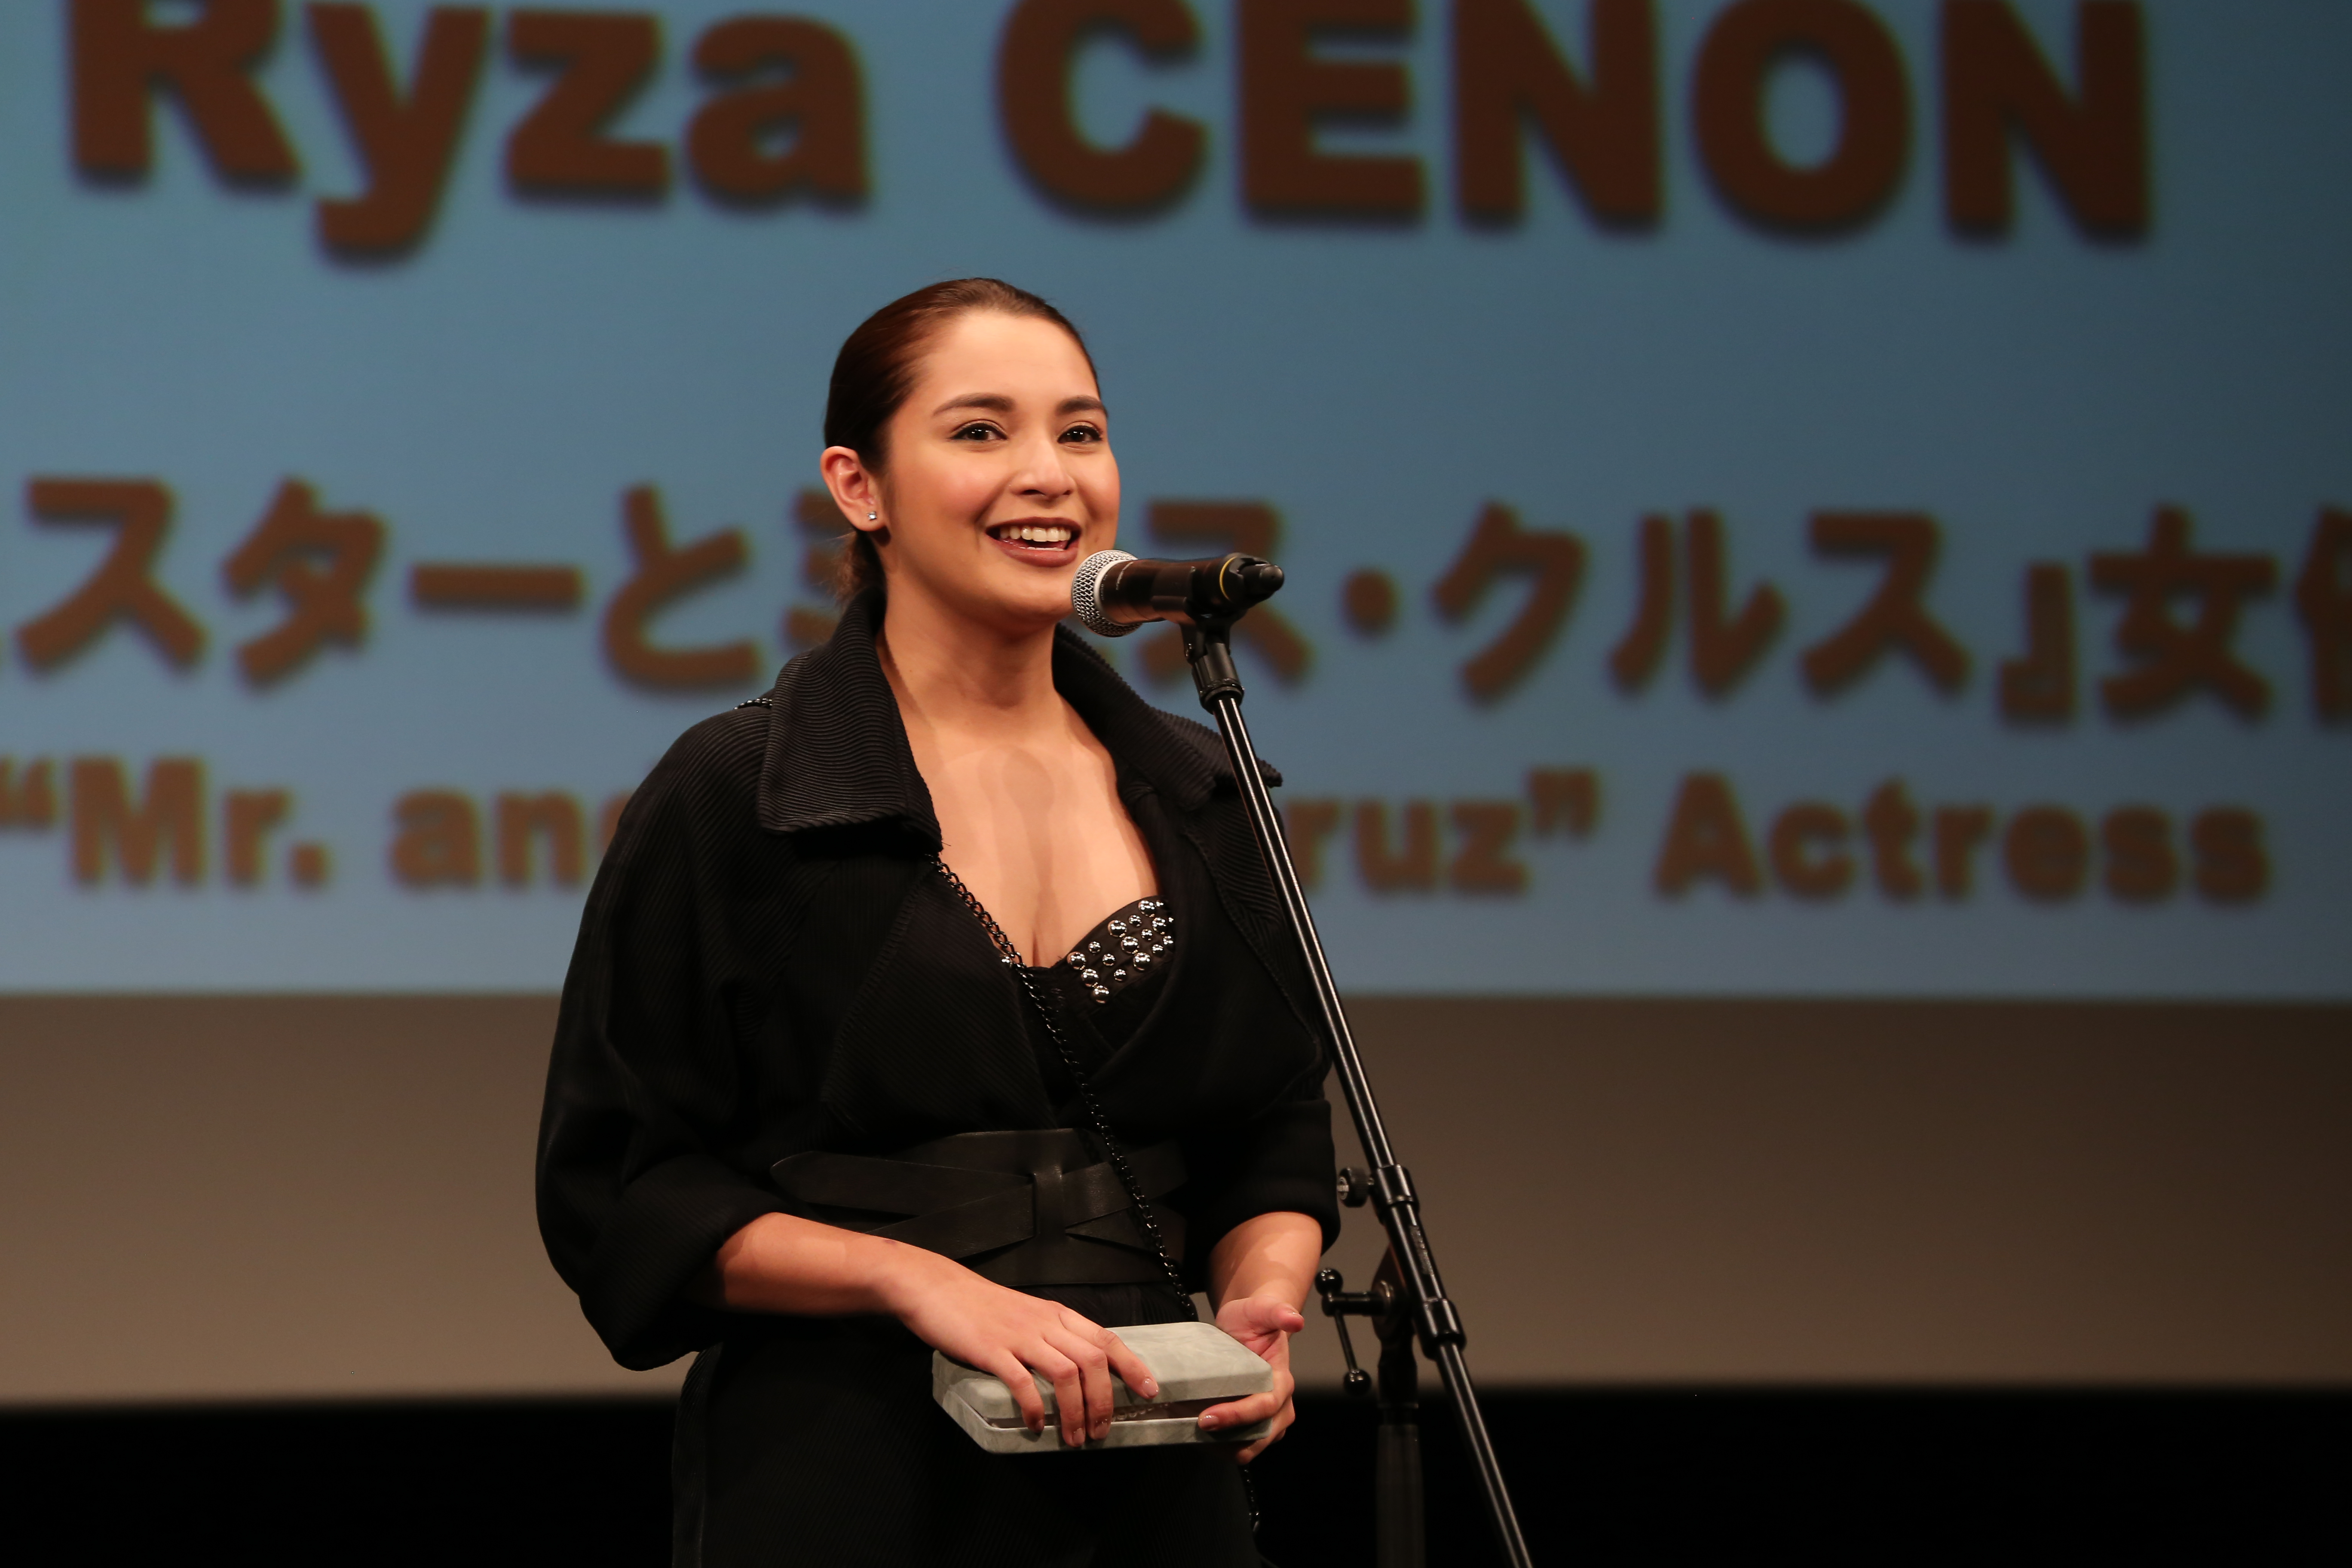 Ryza Cenon Wins Most Brilliant Performer at Osaka Asian Film Fest